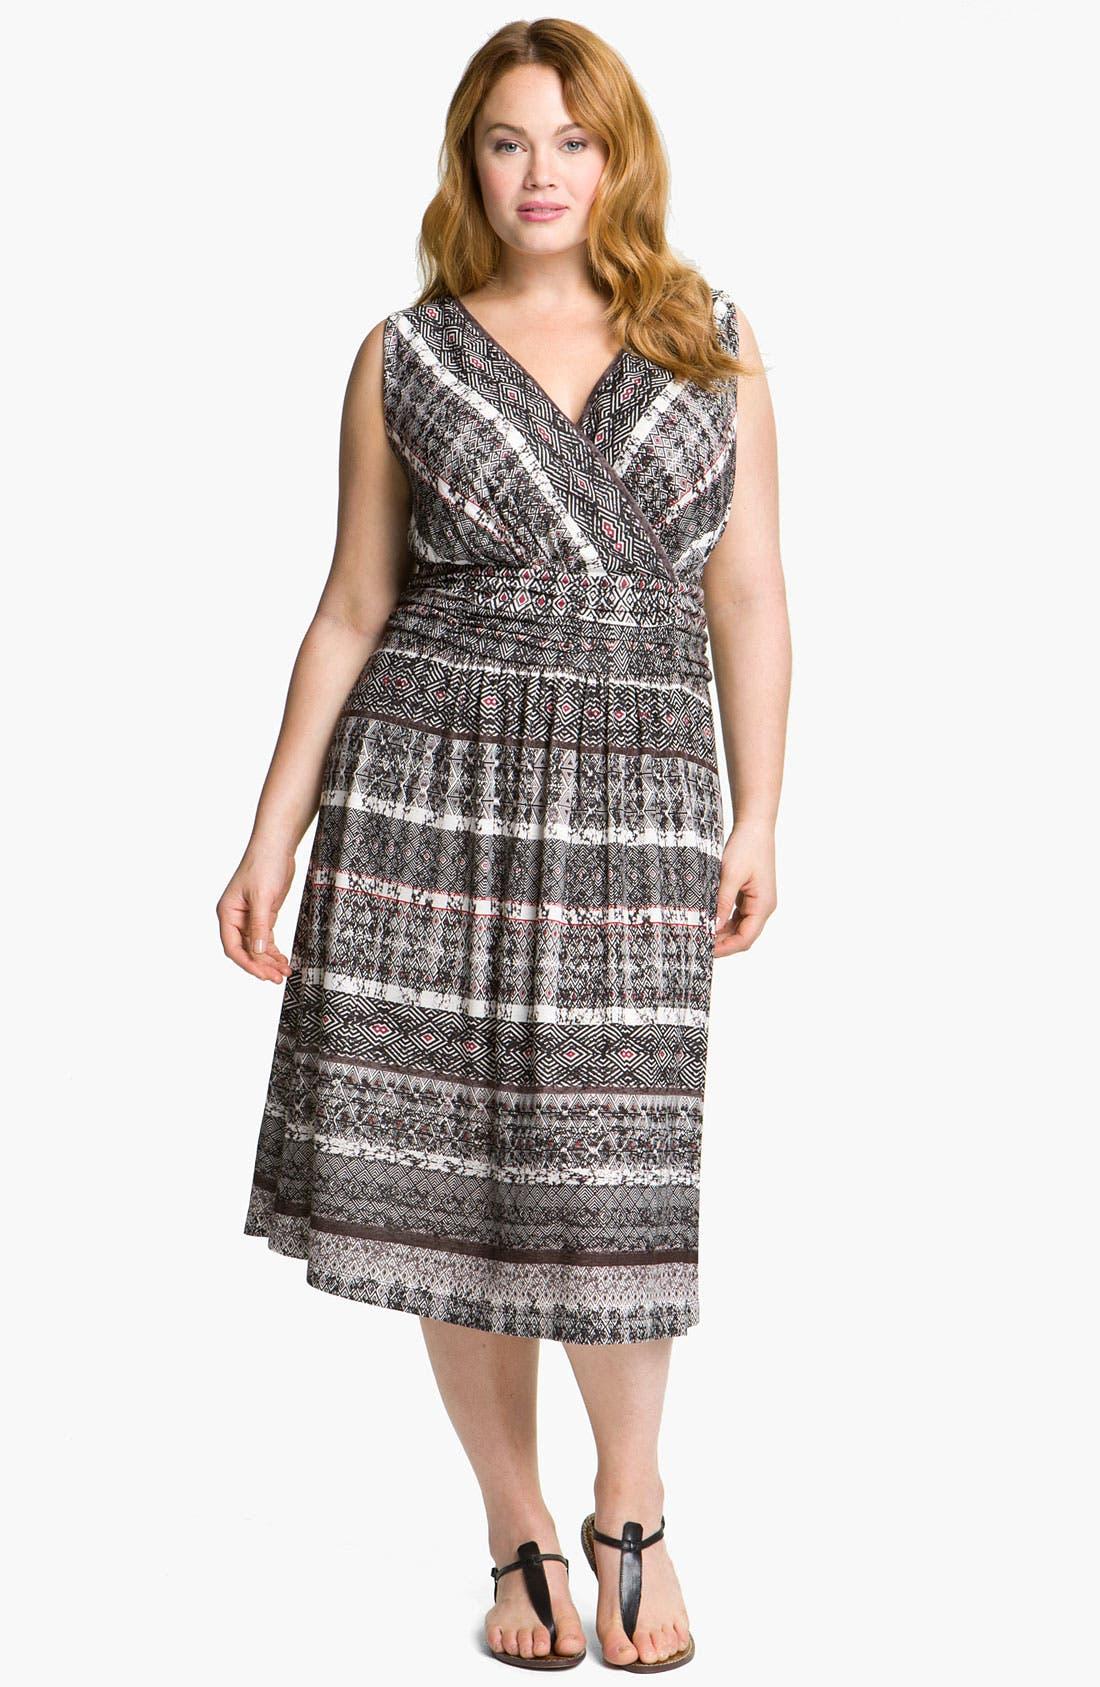 Alternate Image 1 Selected - Nic + Zoe 'Barcelona Block' Dress (Plus)